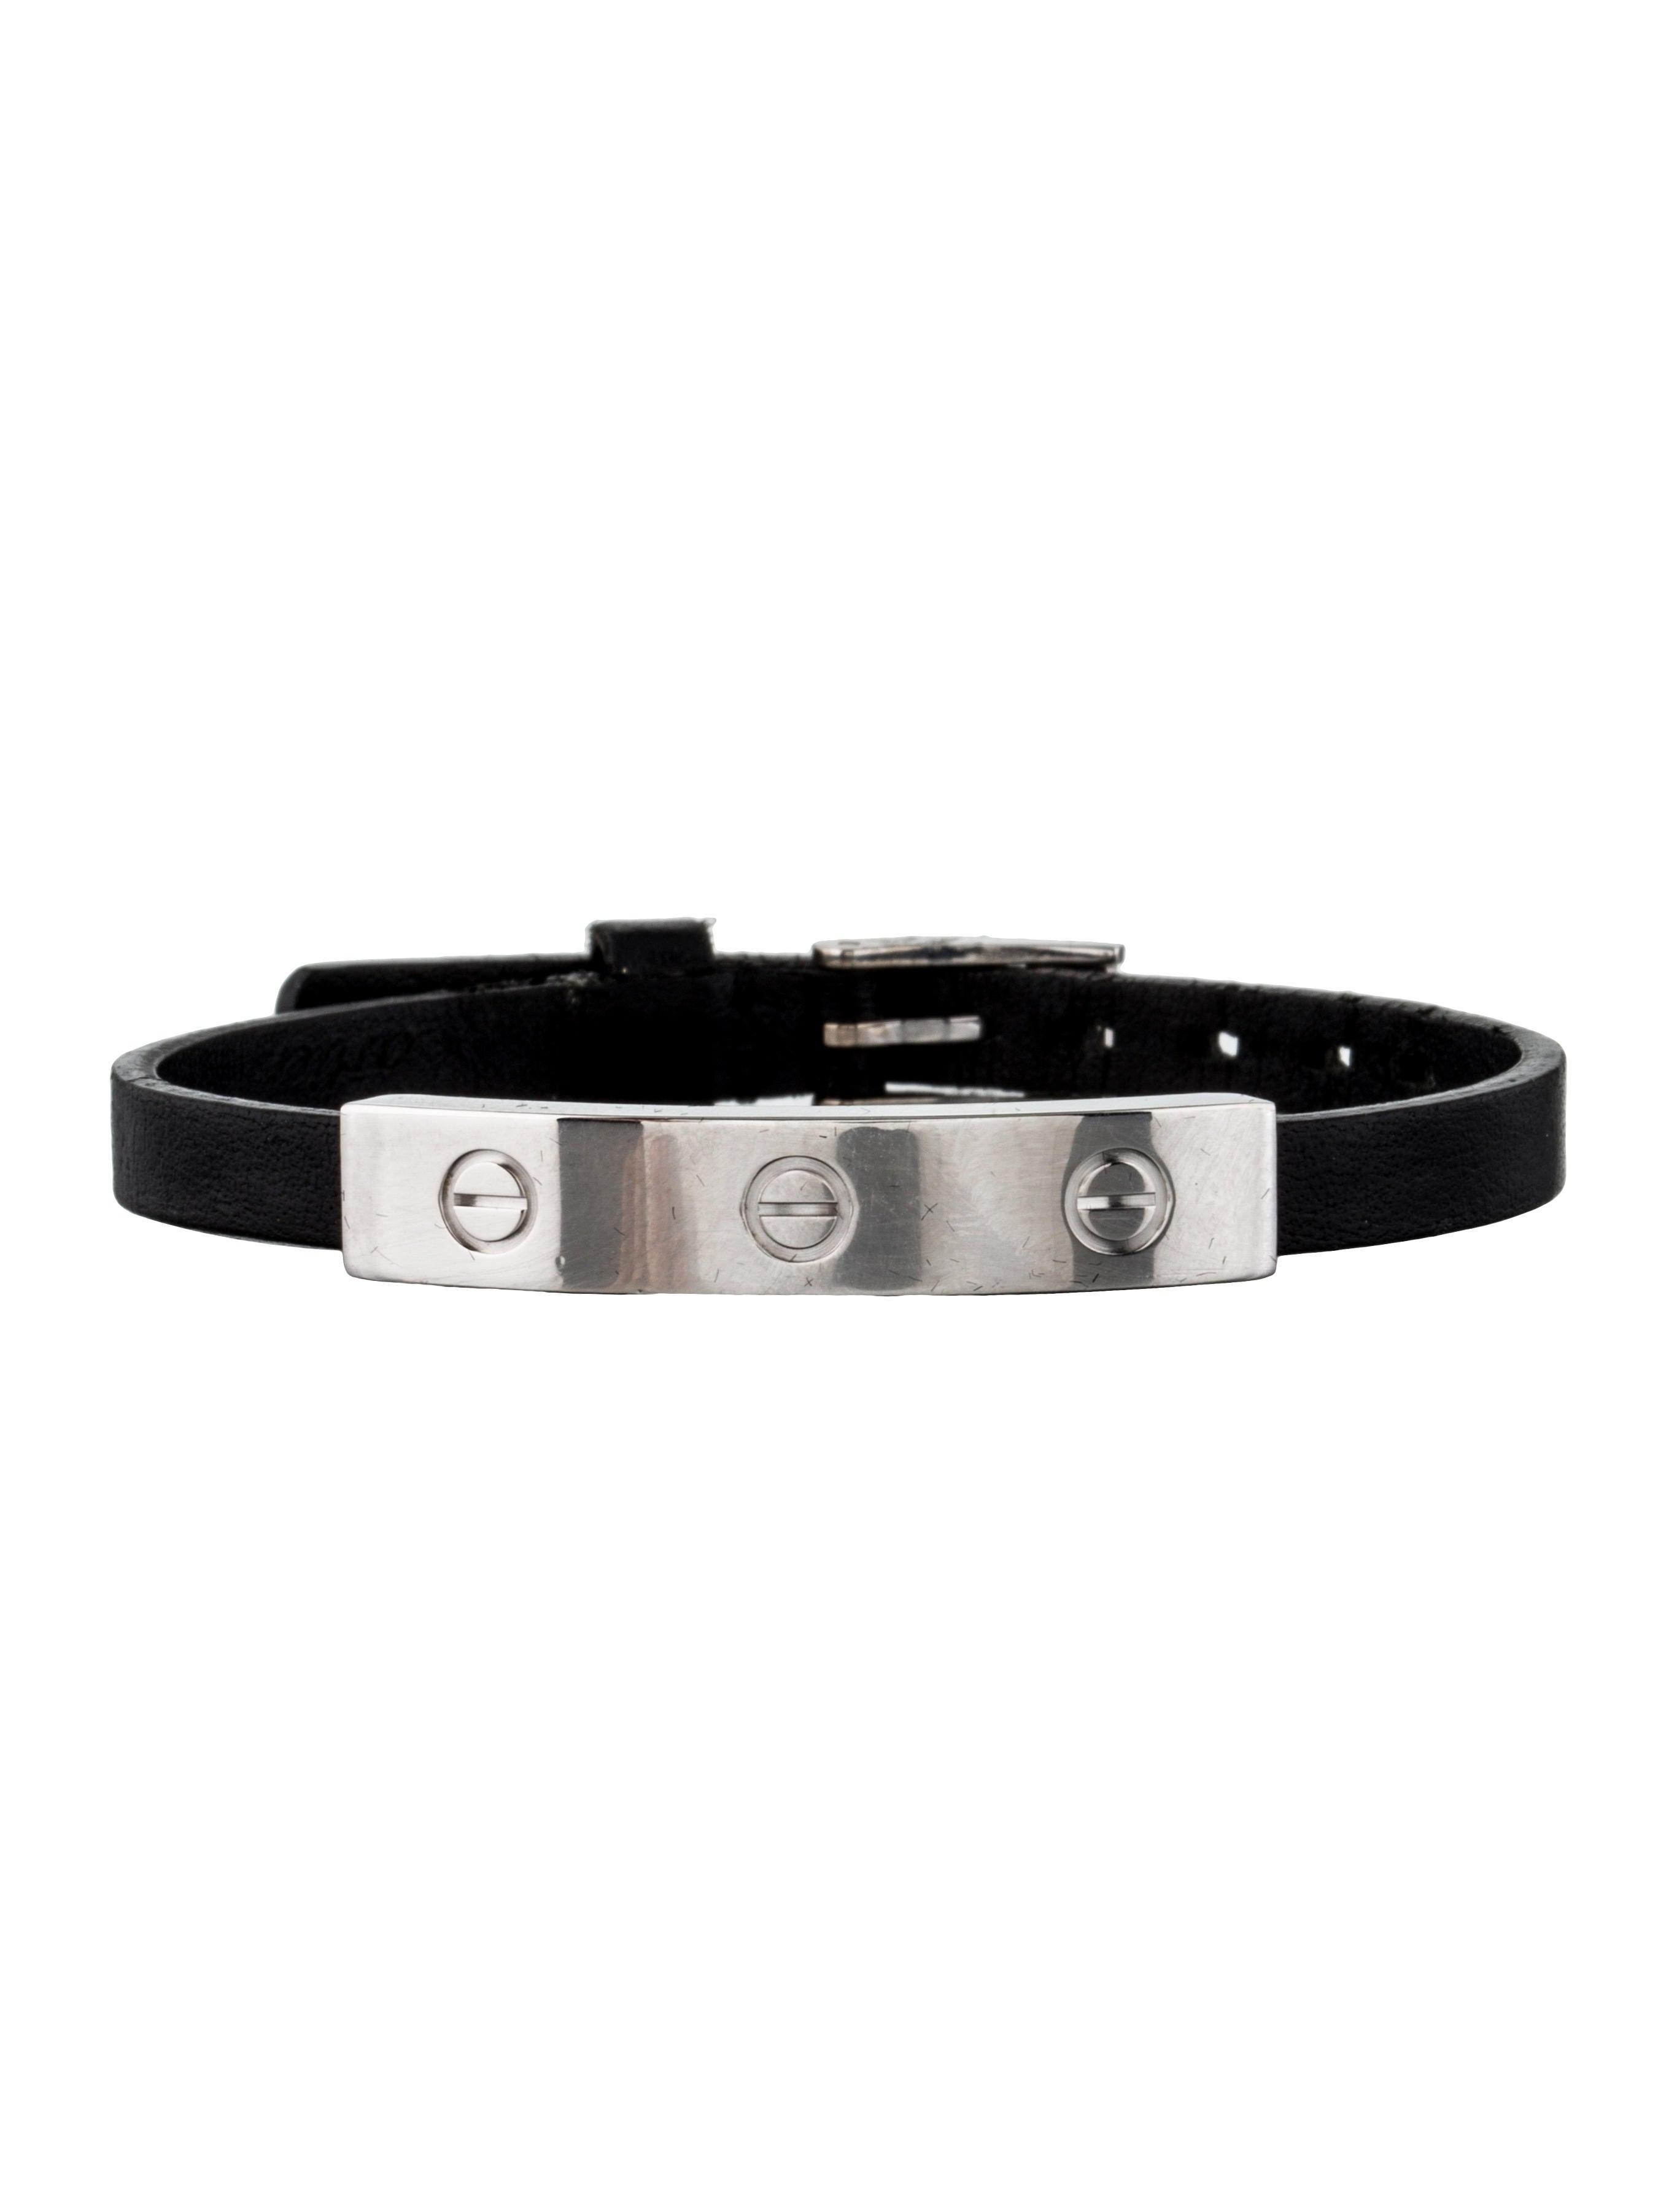 Cartier Leather Love Bracelet Bracelets Crt23874 The